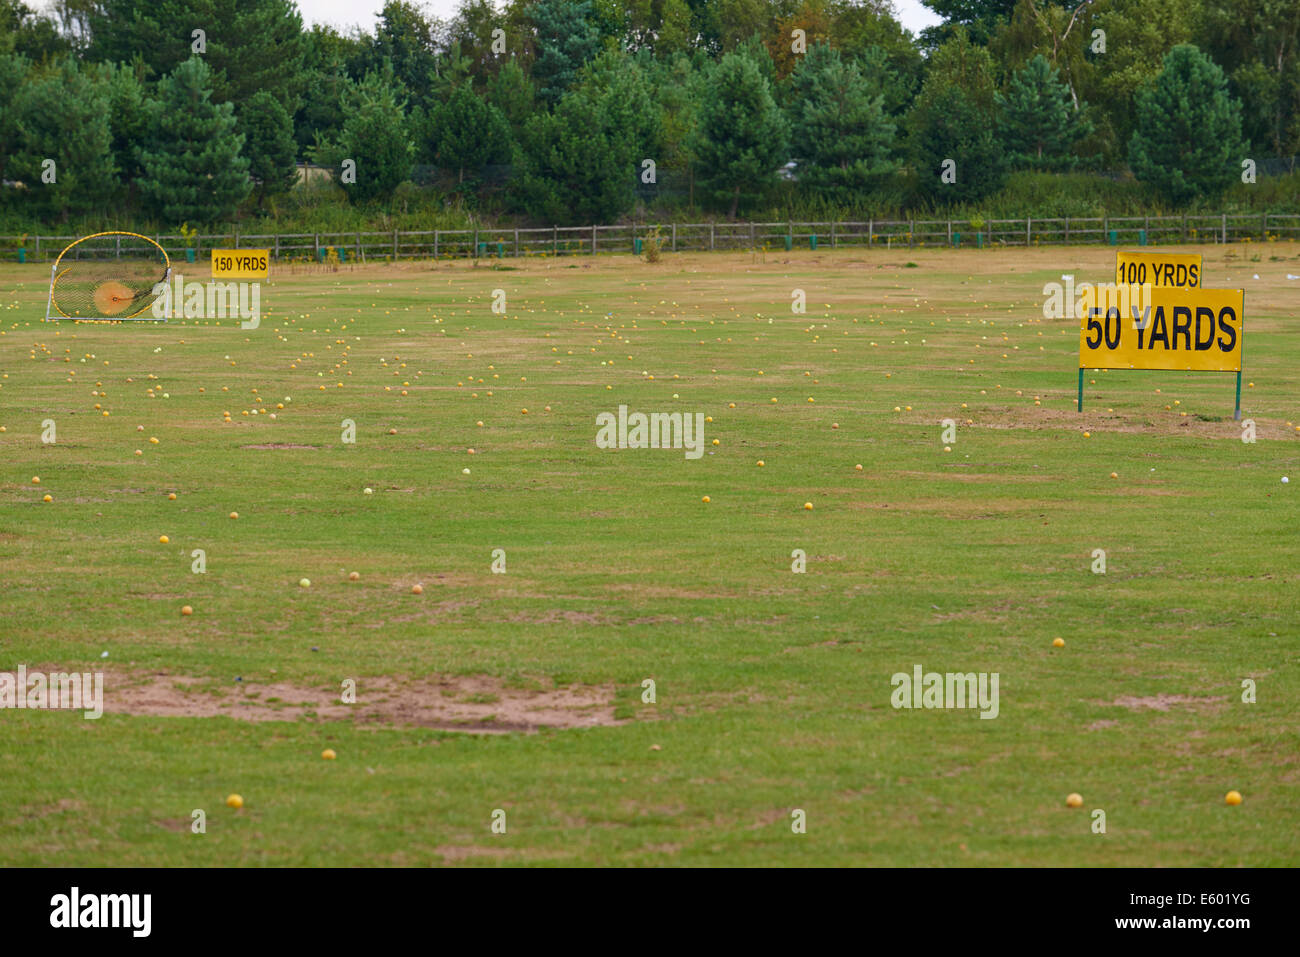 Target Greens At A Golf Driving Range Center Parcs Sherwood Forest UK - Stock Image